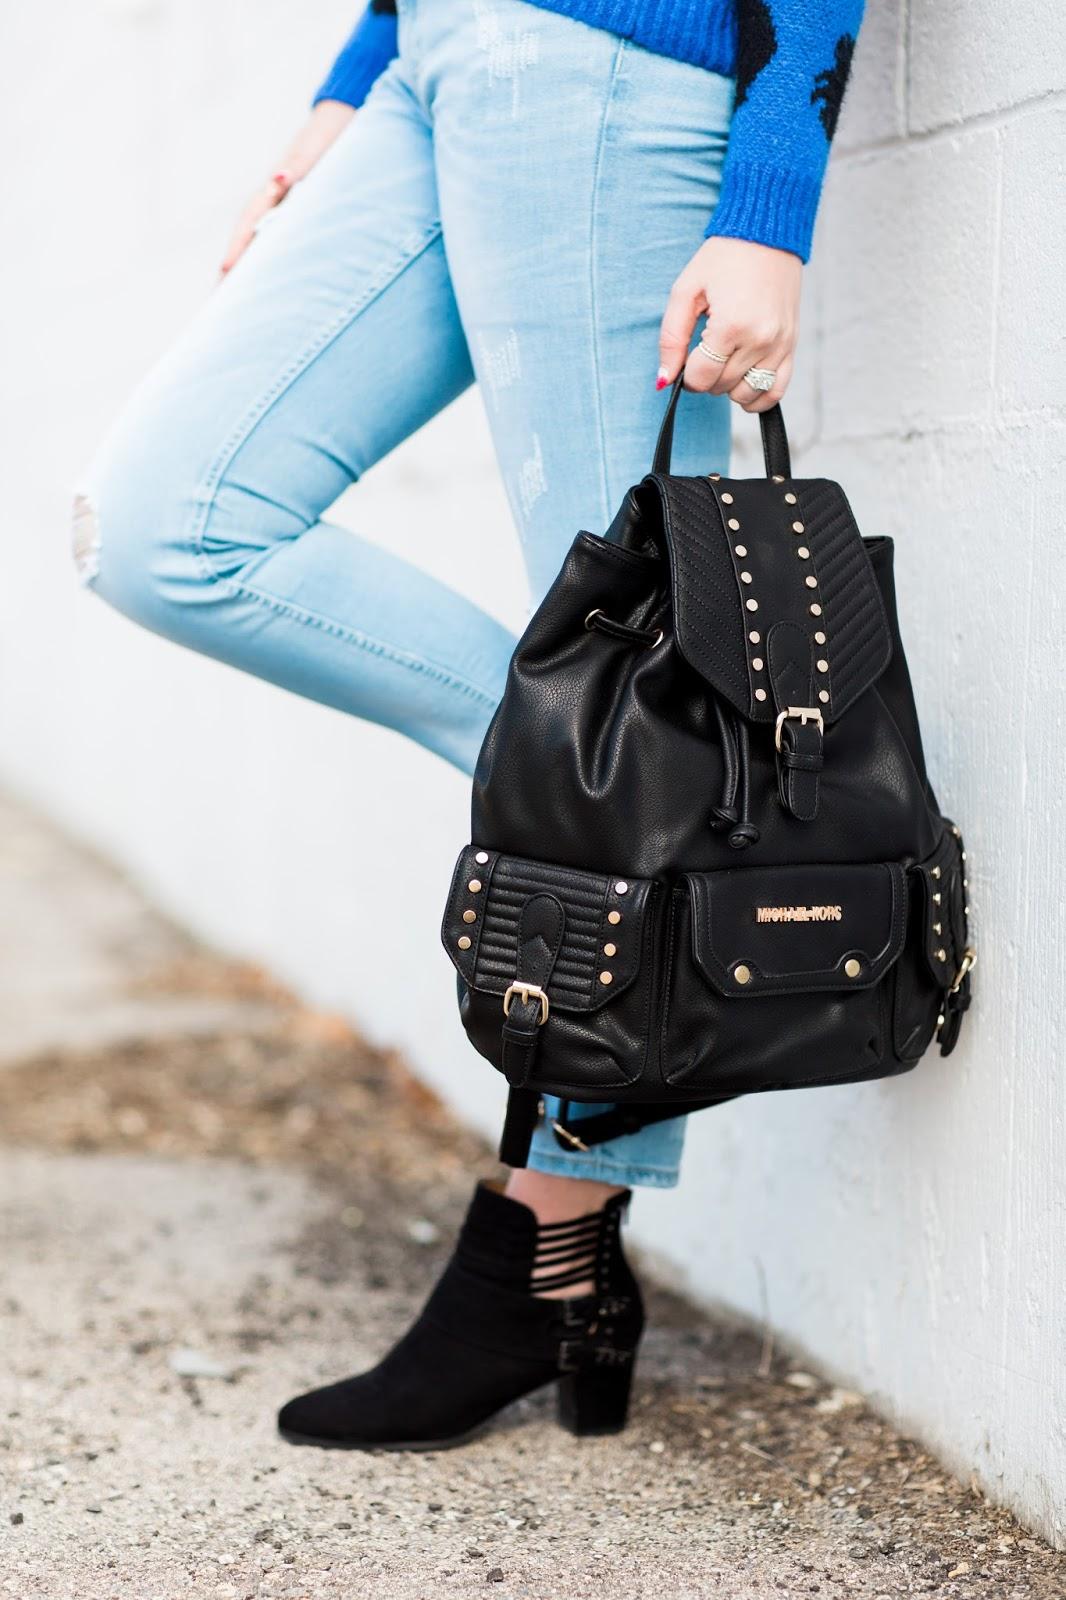 Michael Kors, Studded Backpack, ASOS jeans